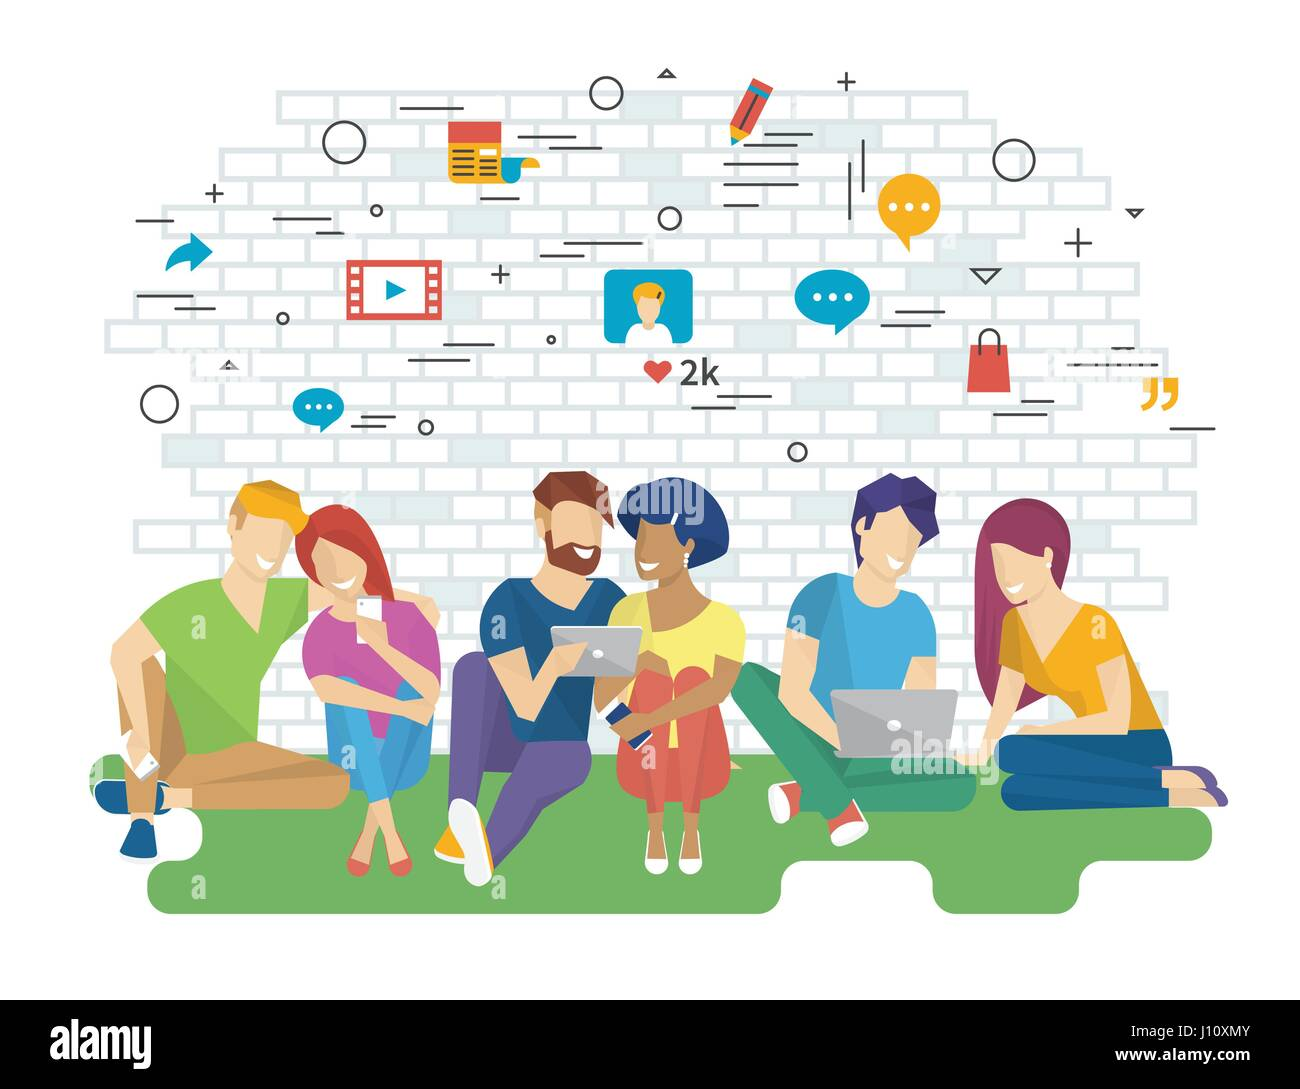 community vector illustration of